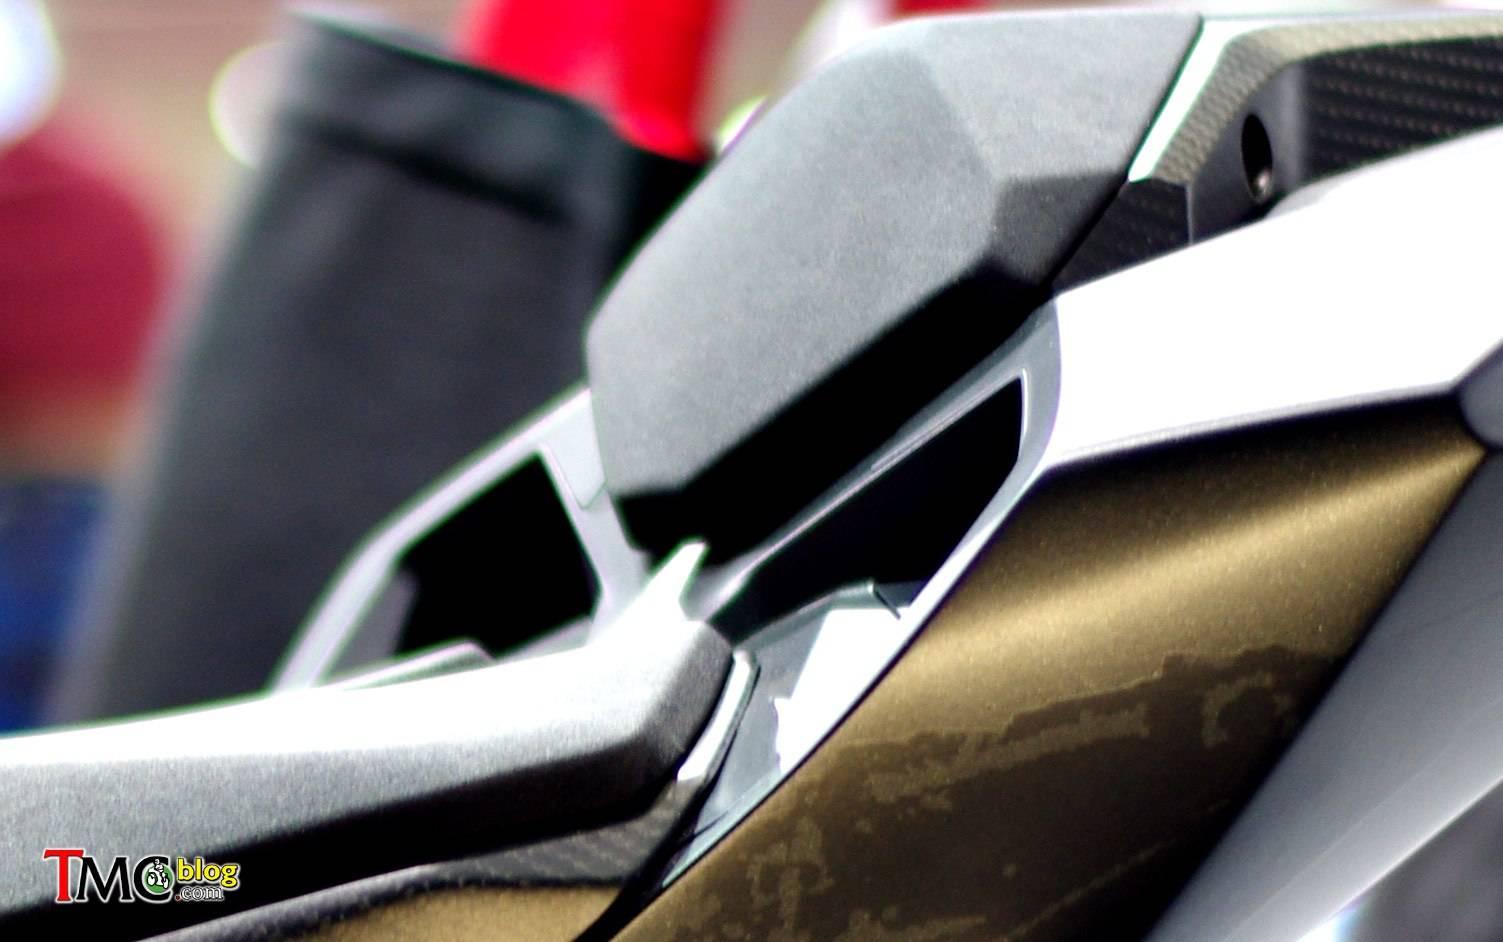 tmcblog.com » Kayak gini Konstruksi Double Muffler Honda